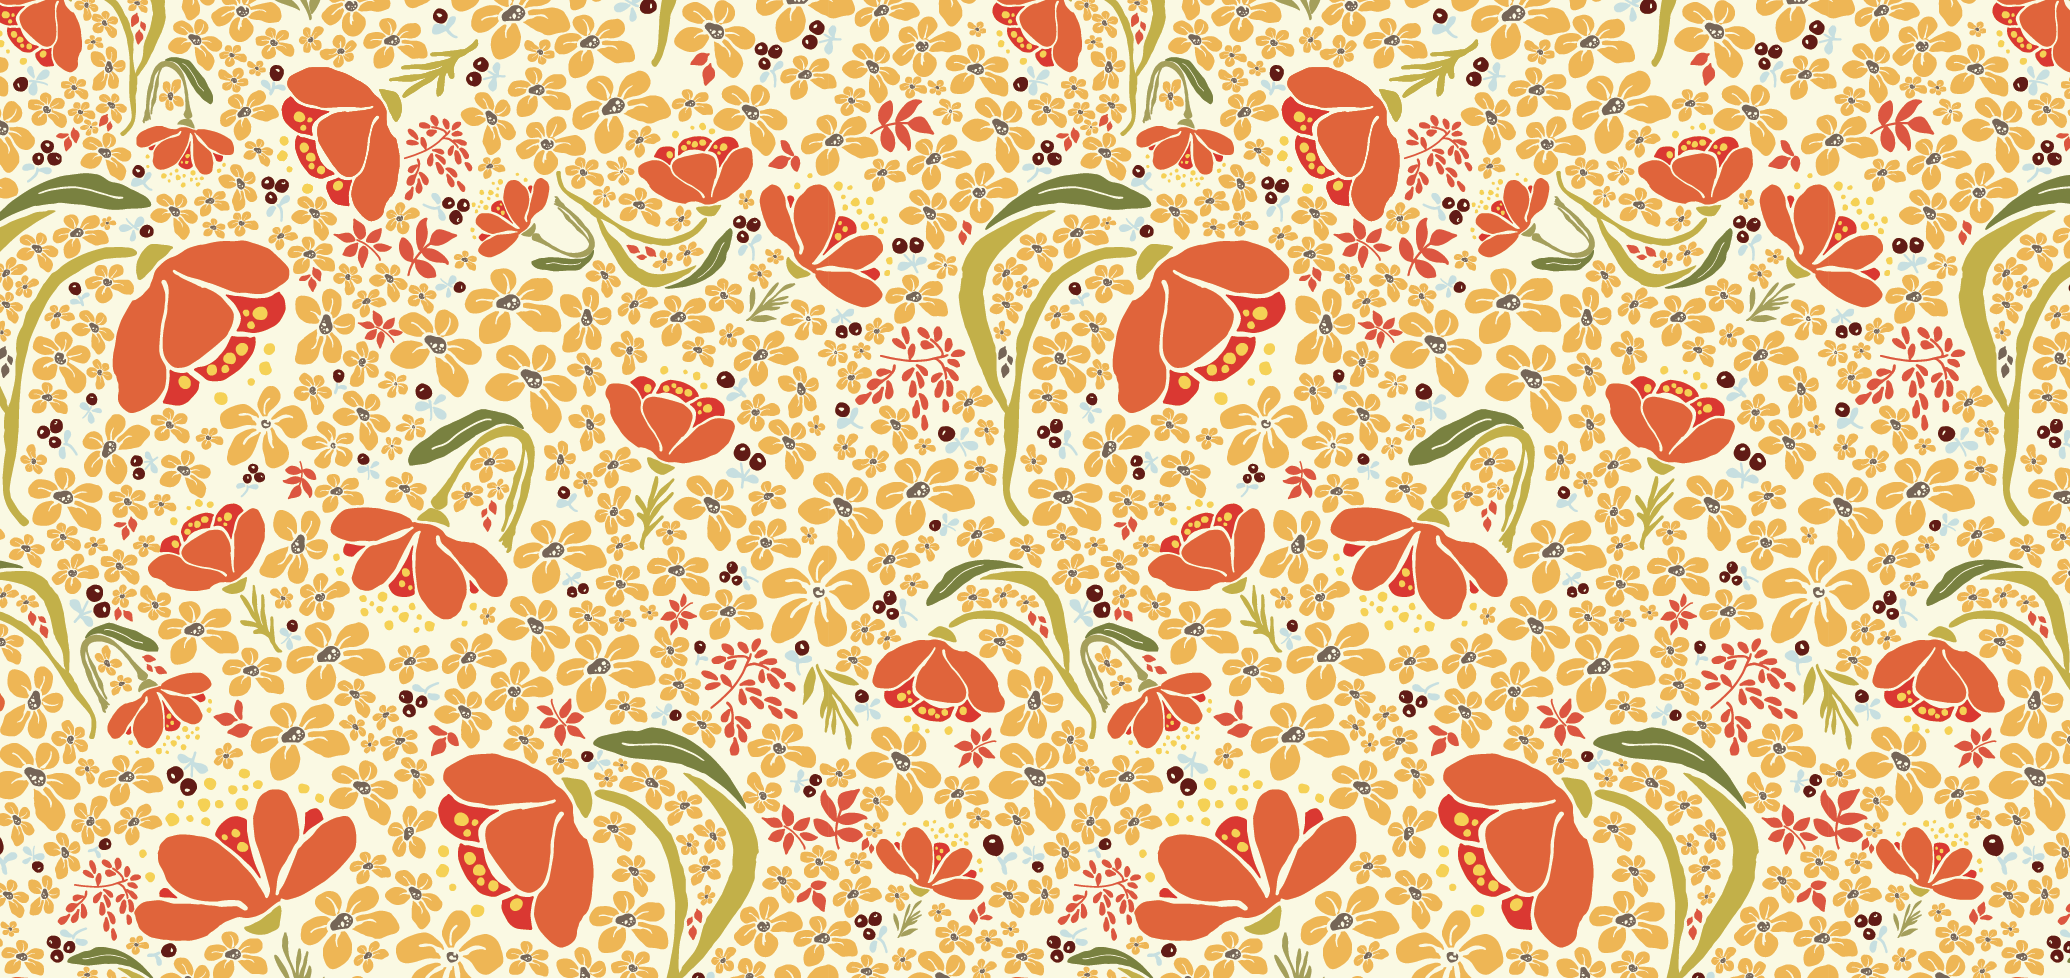 elena-wilken-walk-in-the-countryside-surface-pattern-design8.png